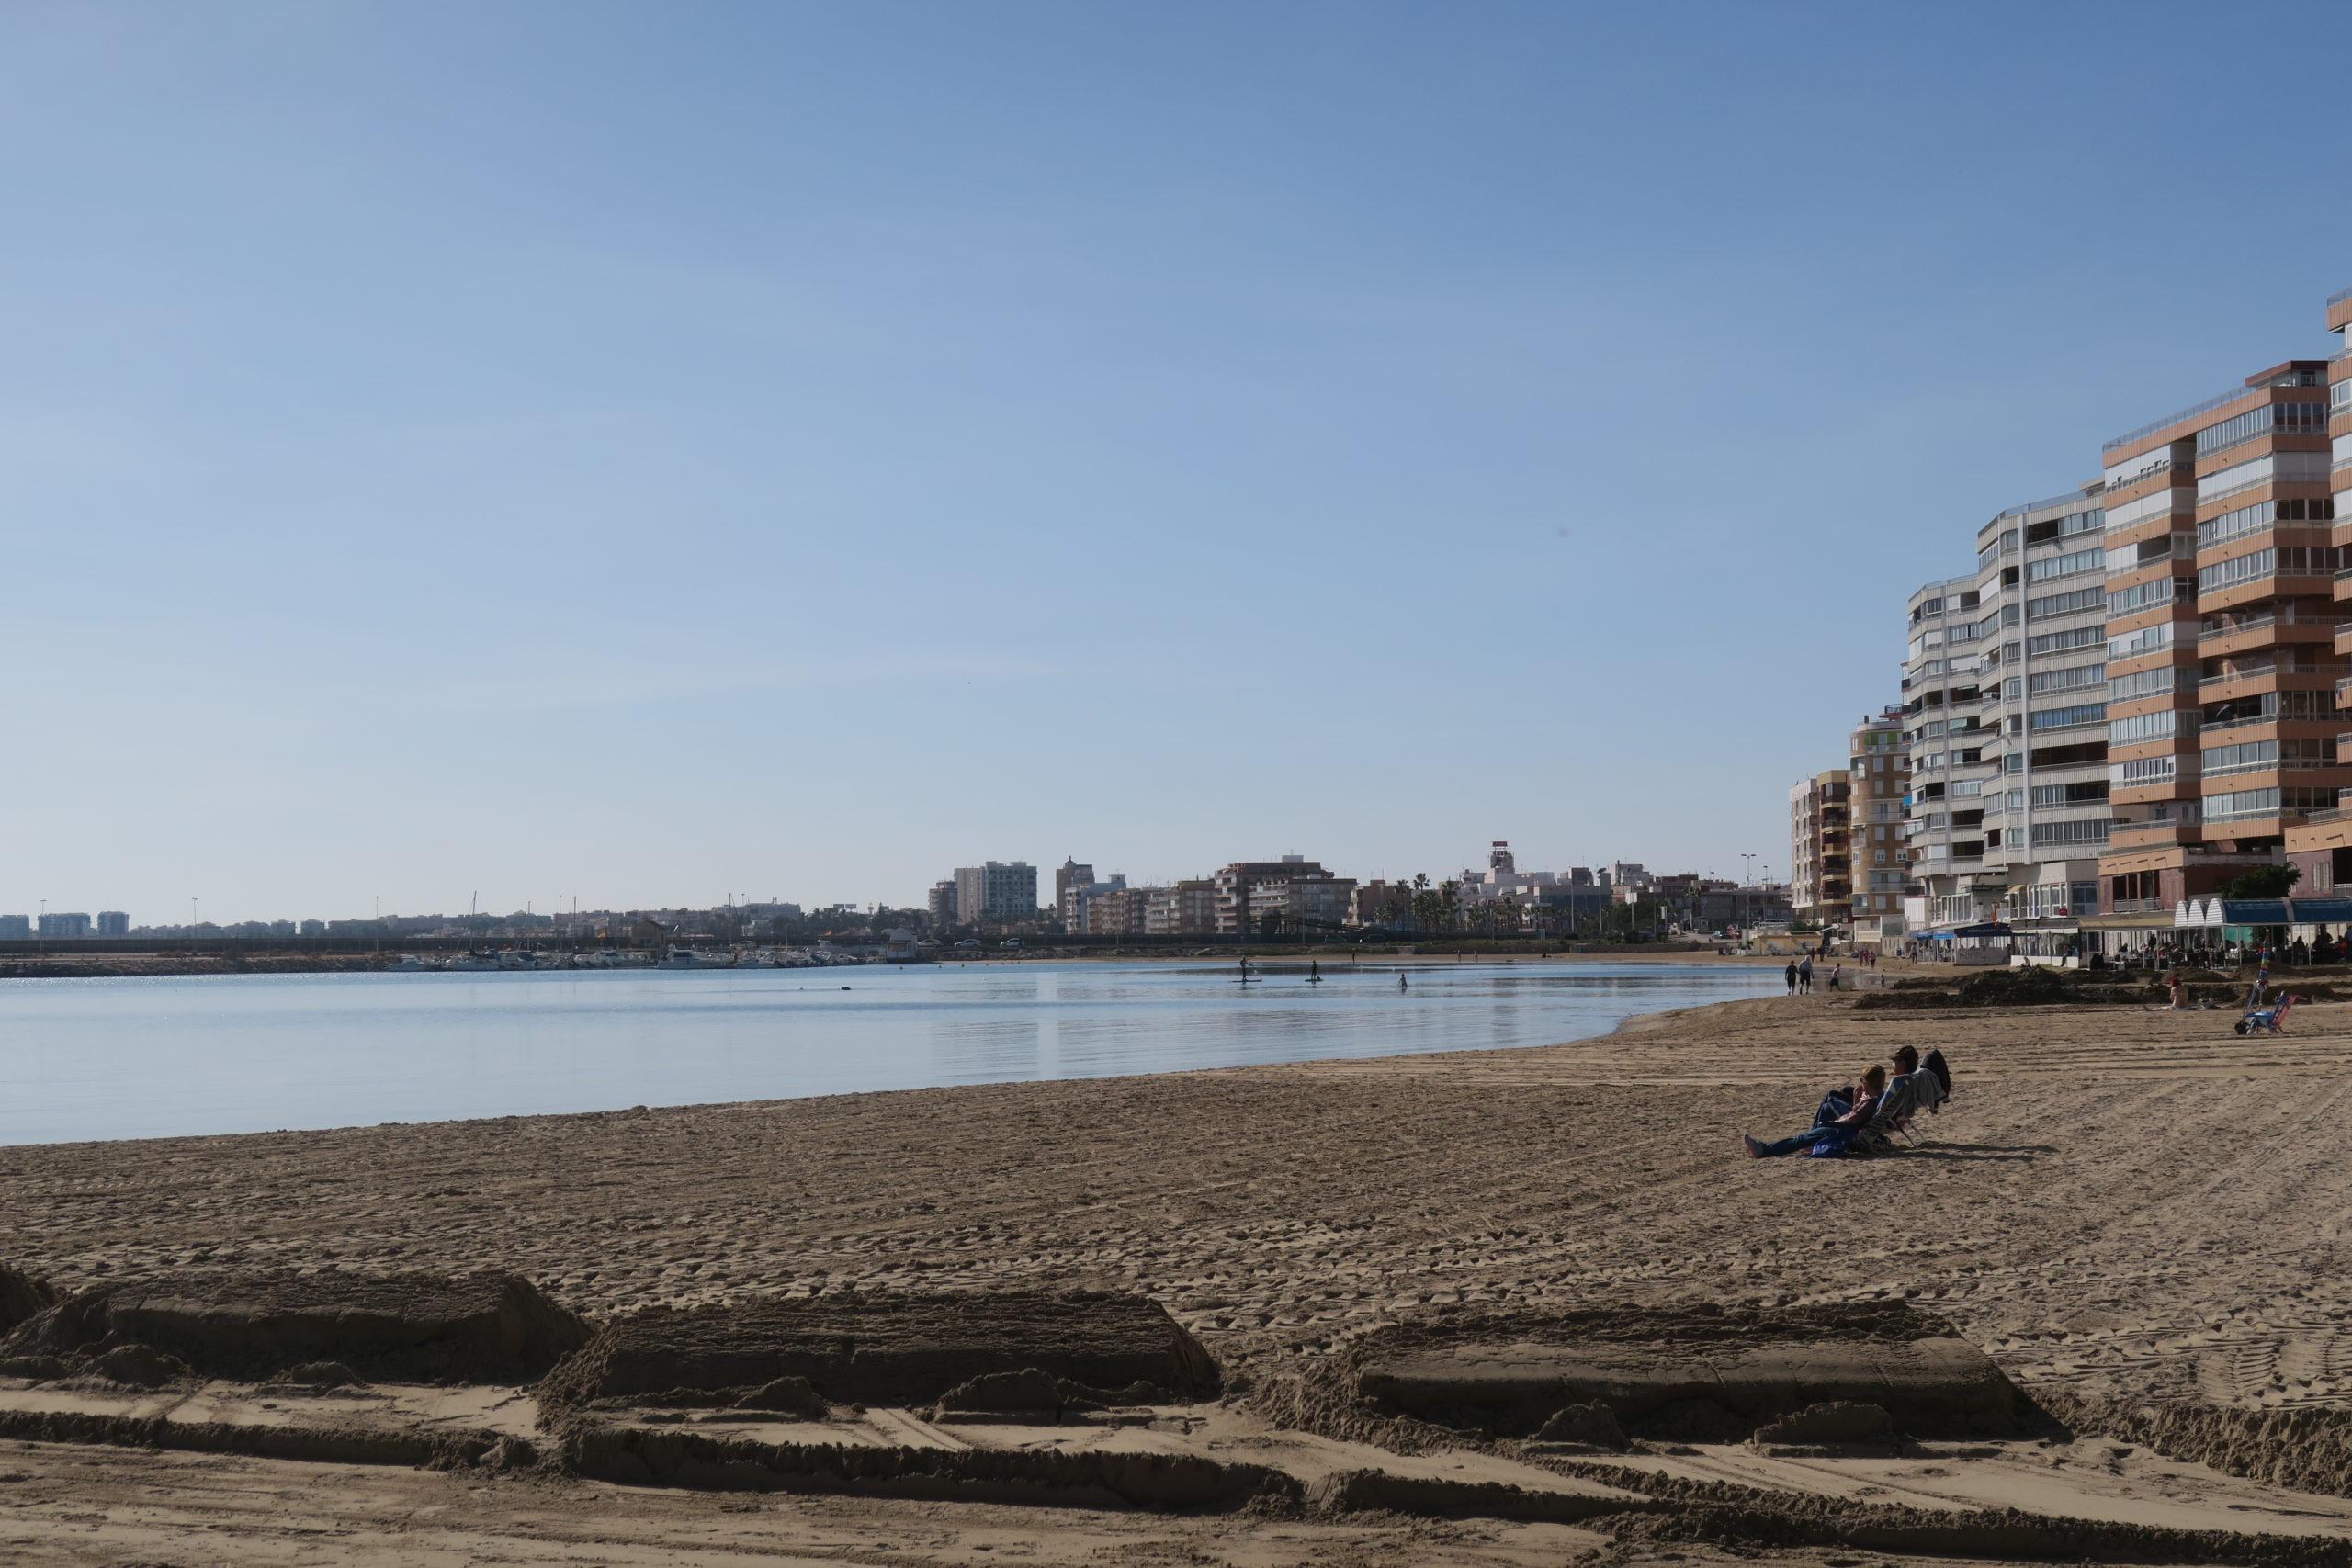 Torrevieja. Fredagspromenad söderut längs havet.